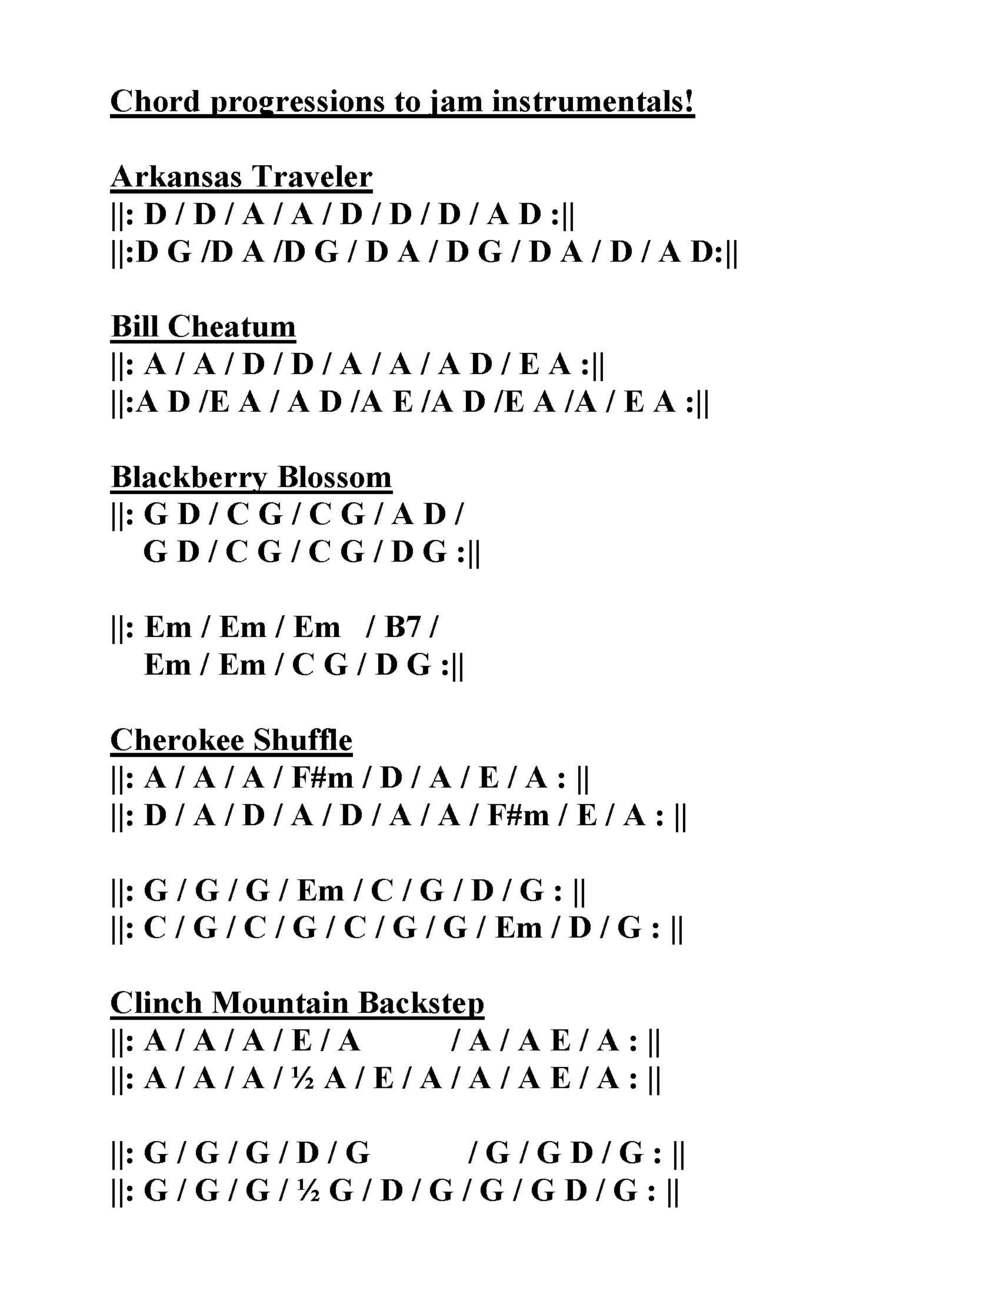 Jam instrumental chord progressions_Page_1.jpg